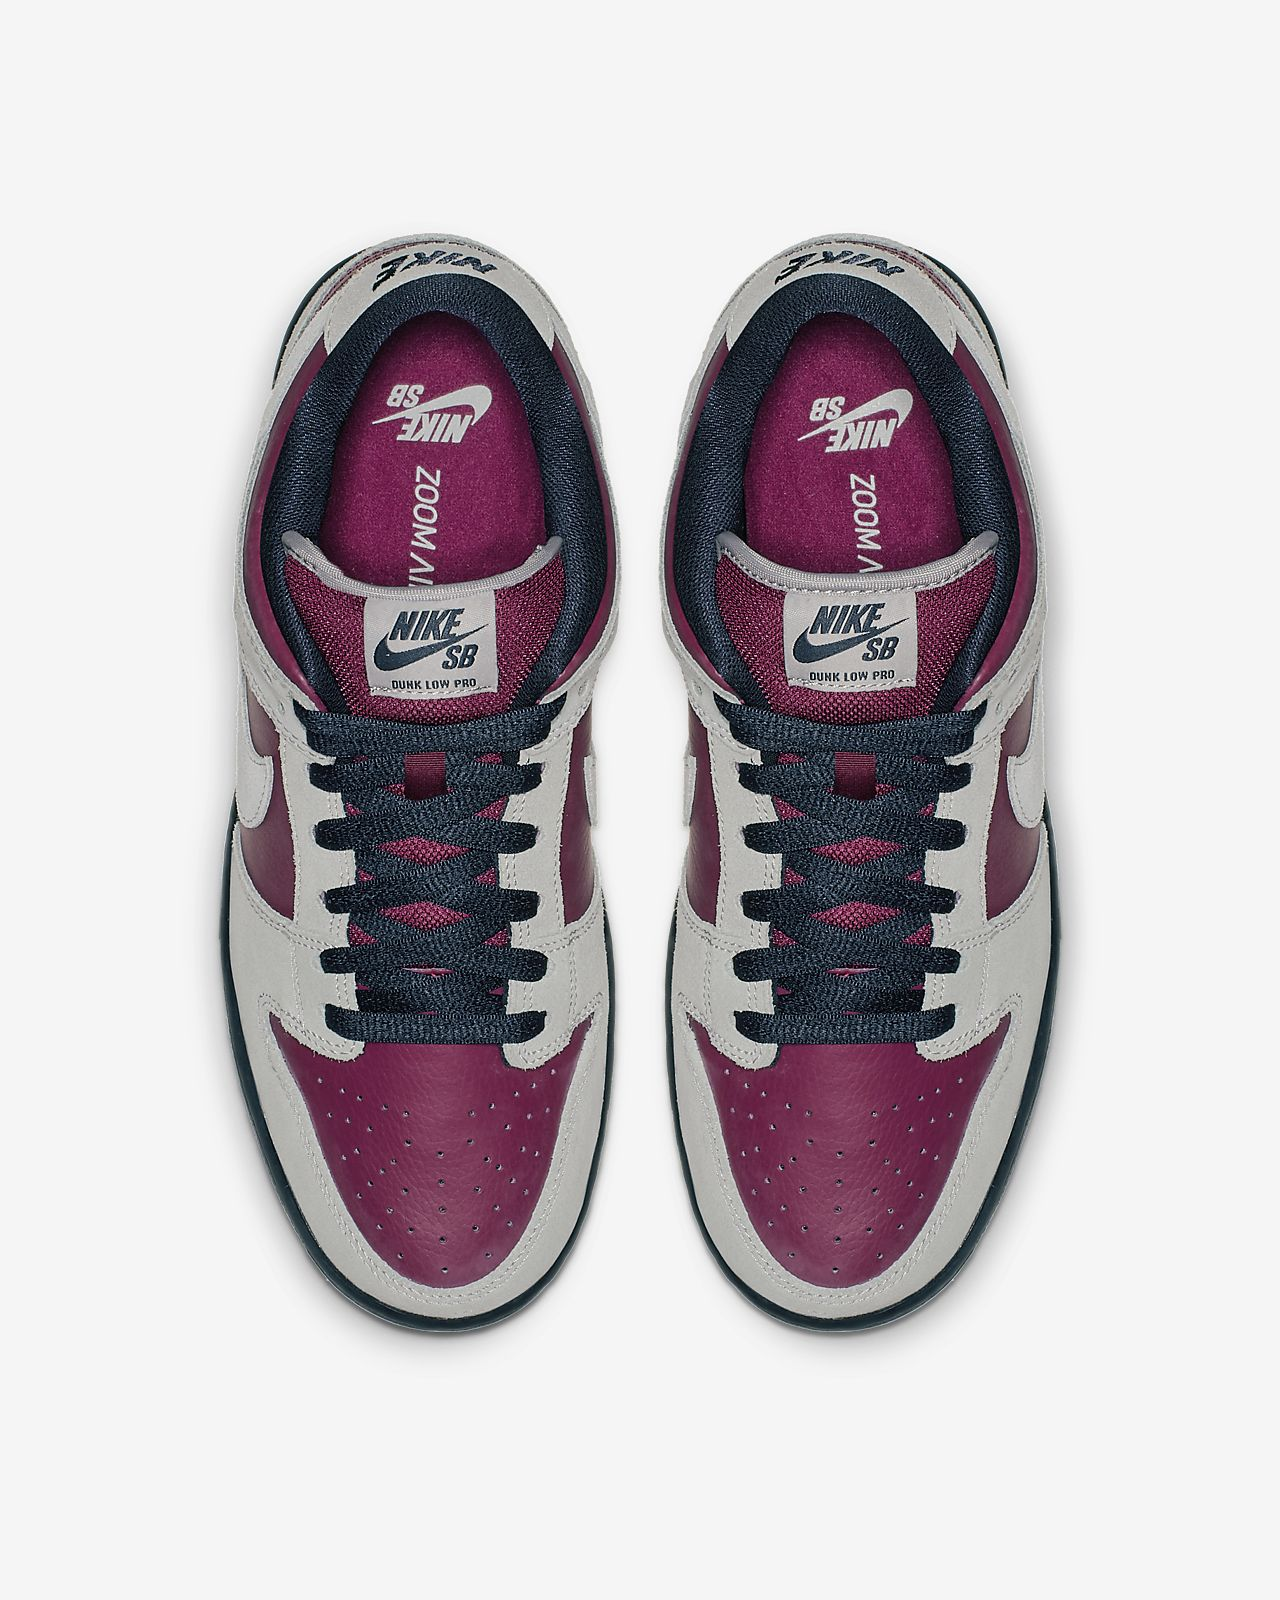 premium selection 2a8c4 41006 ... Skateboardsko Nike SB Dunk Low Pro